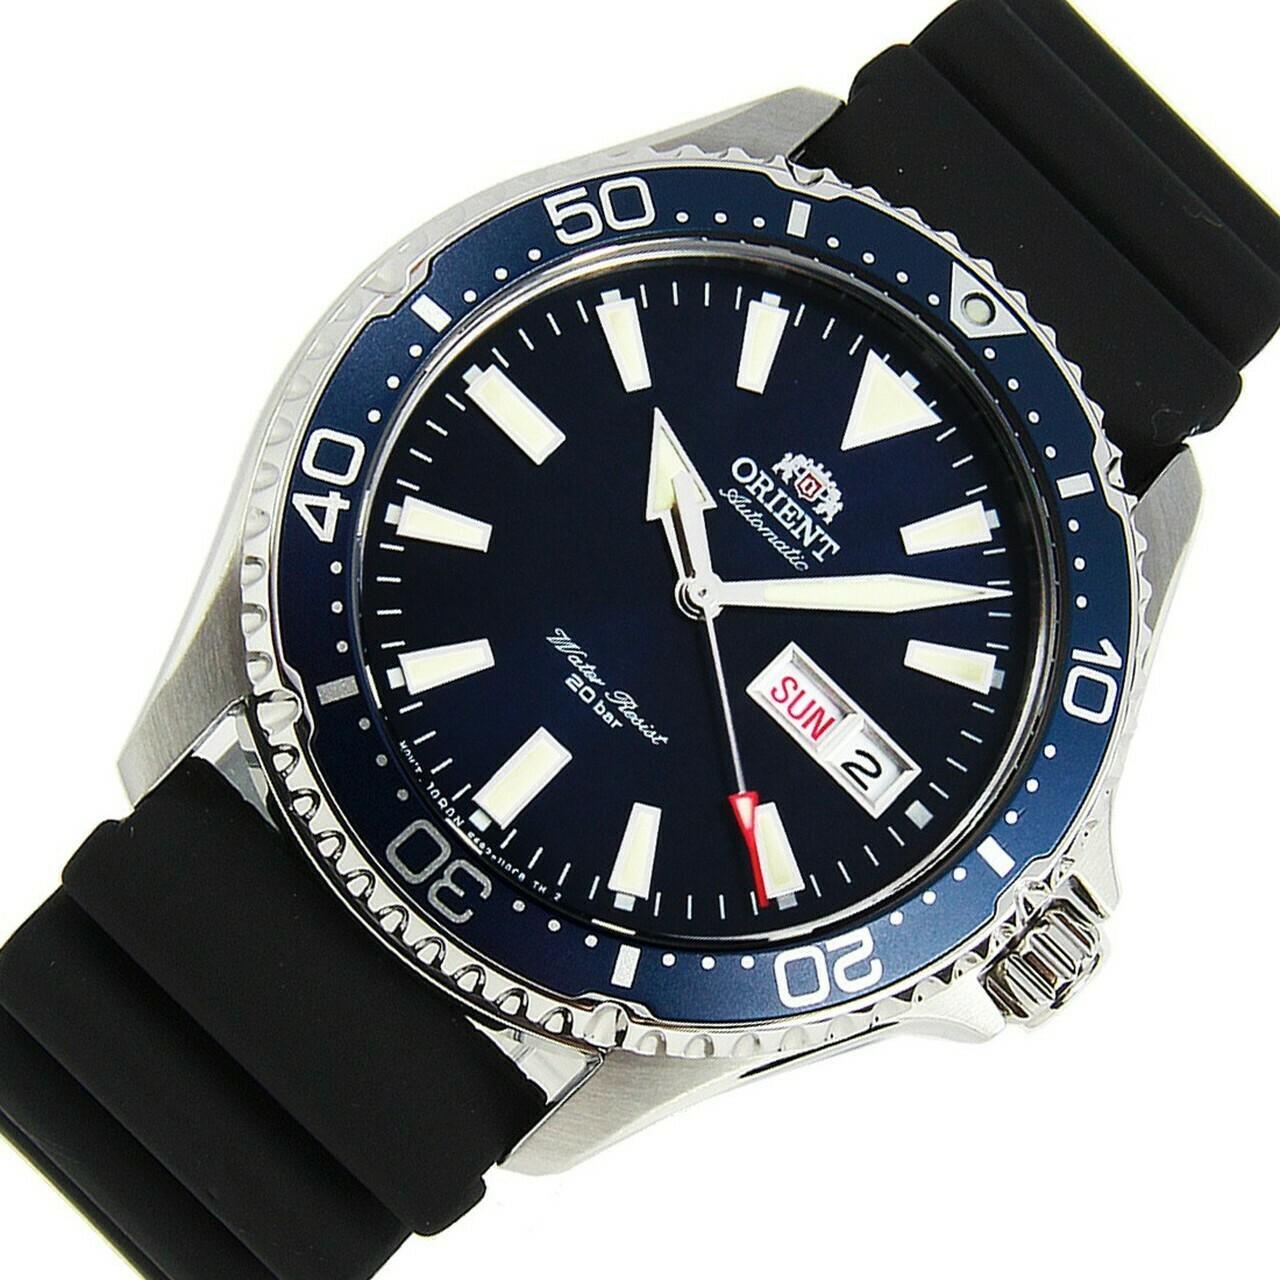 Reloj Automático Hombre Orient Kamasu RA-AA0006L Mako III buceo correa goma